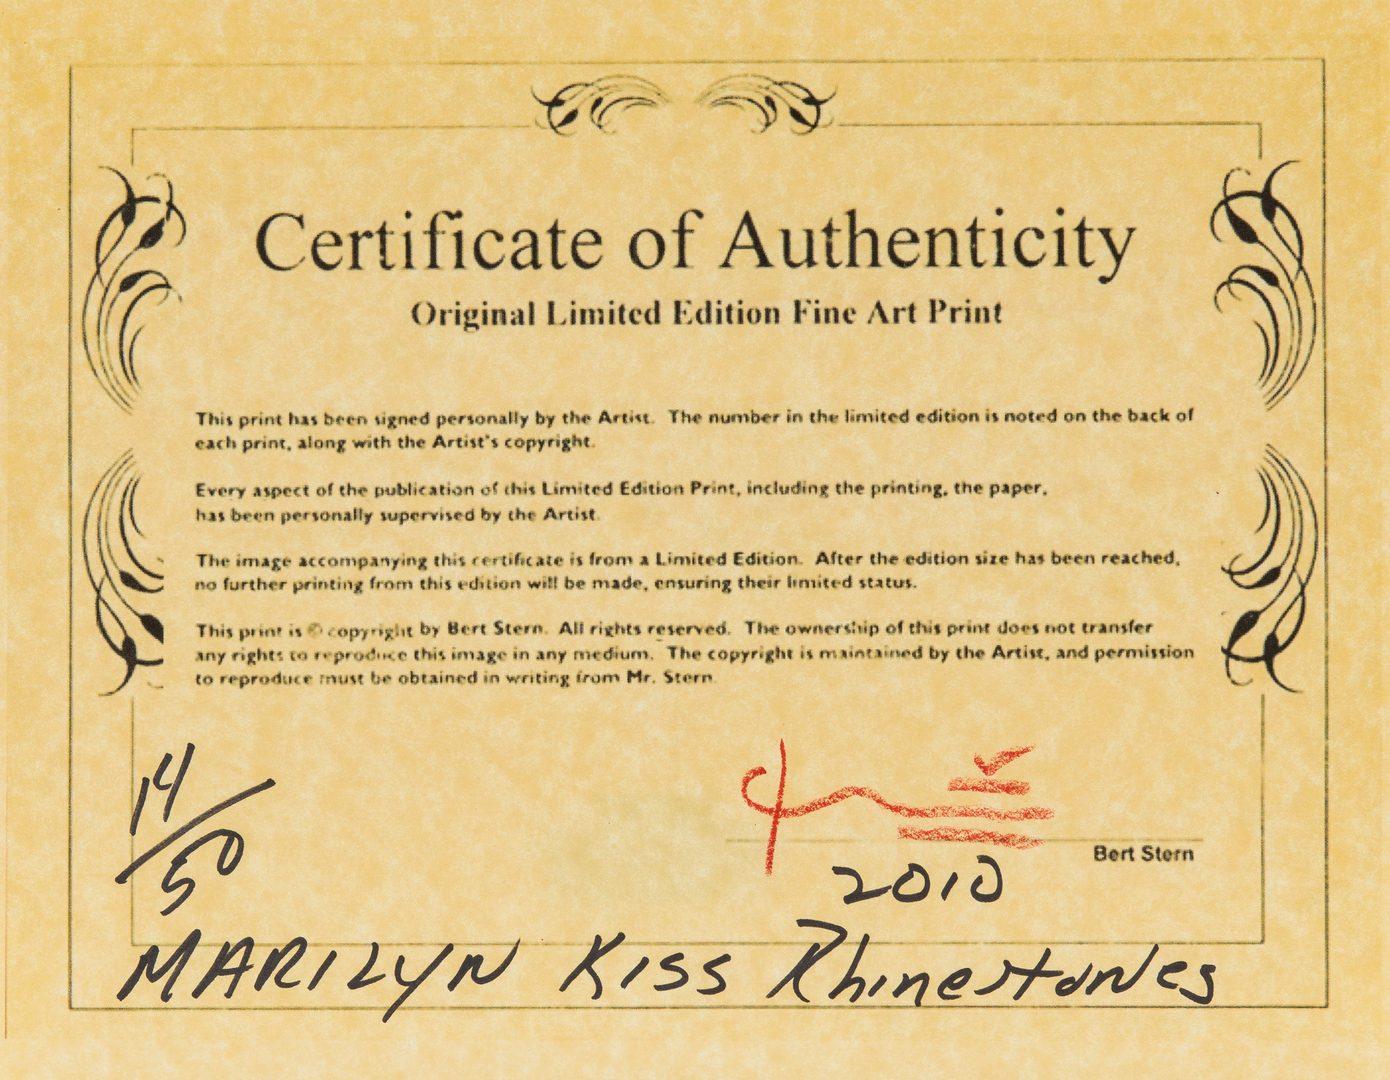 Lot 557: Bert Stern Marilyn Monroe Last Sitting Photograph, Kiss in Rhinestones